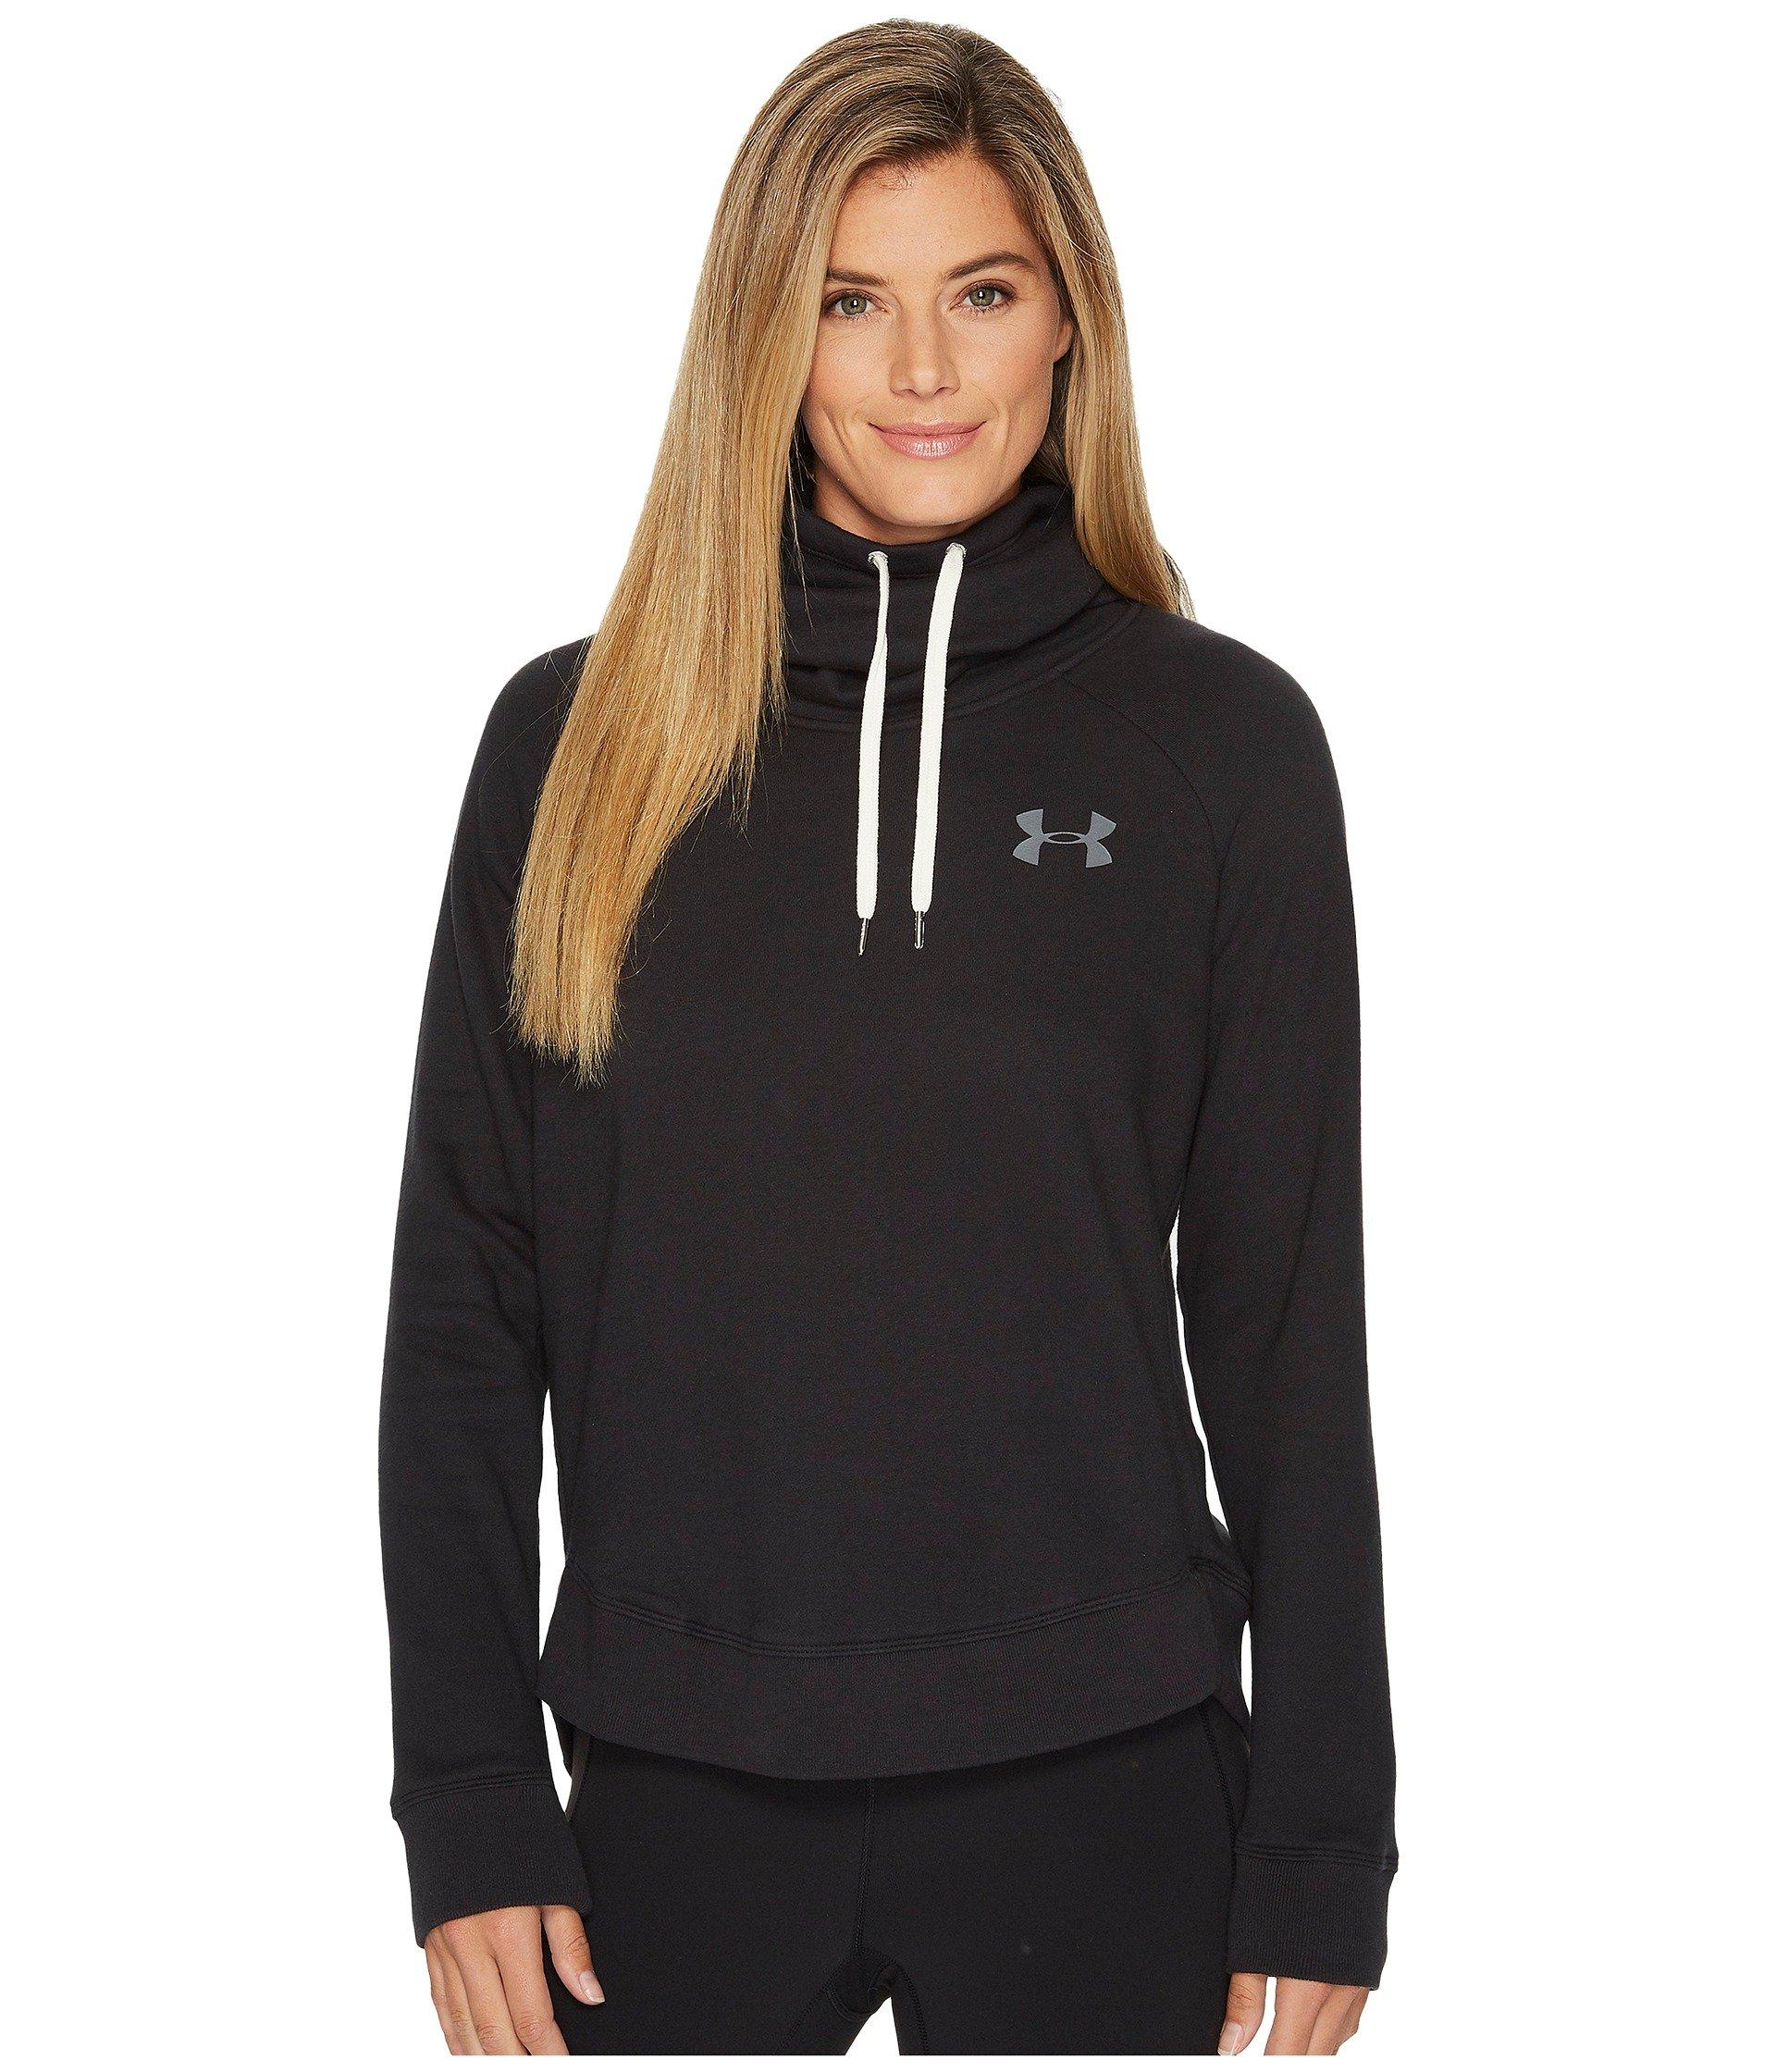 Under Armour Women's Novelty Favorite Pull Over Left Chest Jacket, Black /Graphite, Large